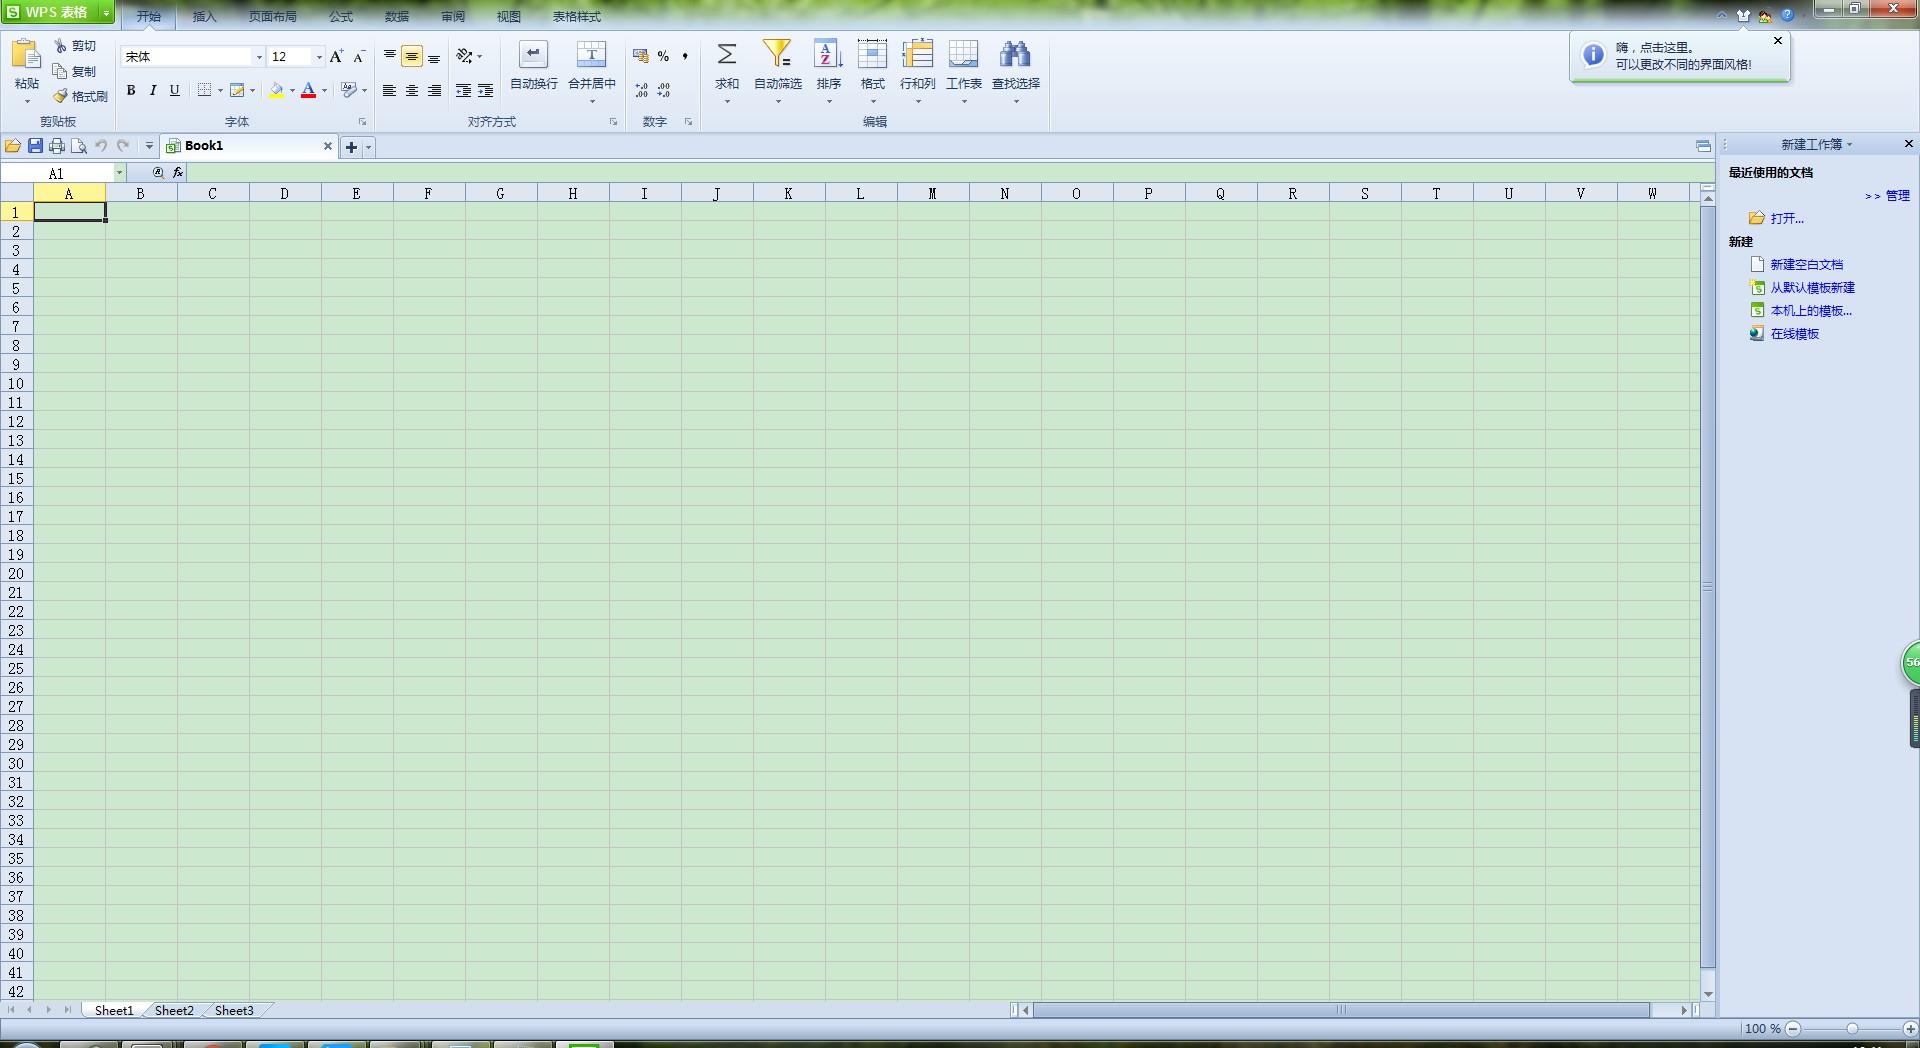 WPS 2012最新版 v2.0 官方完整版 2